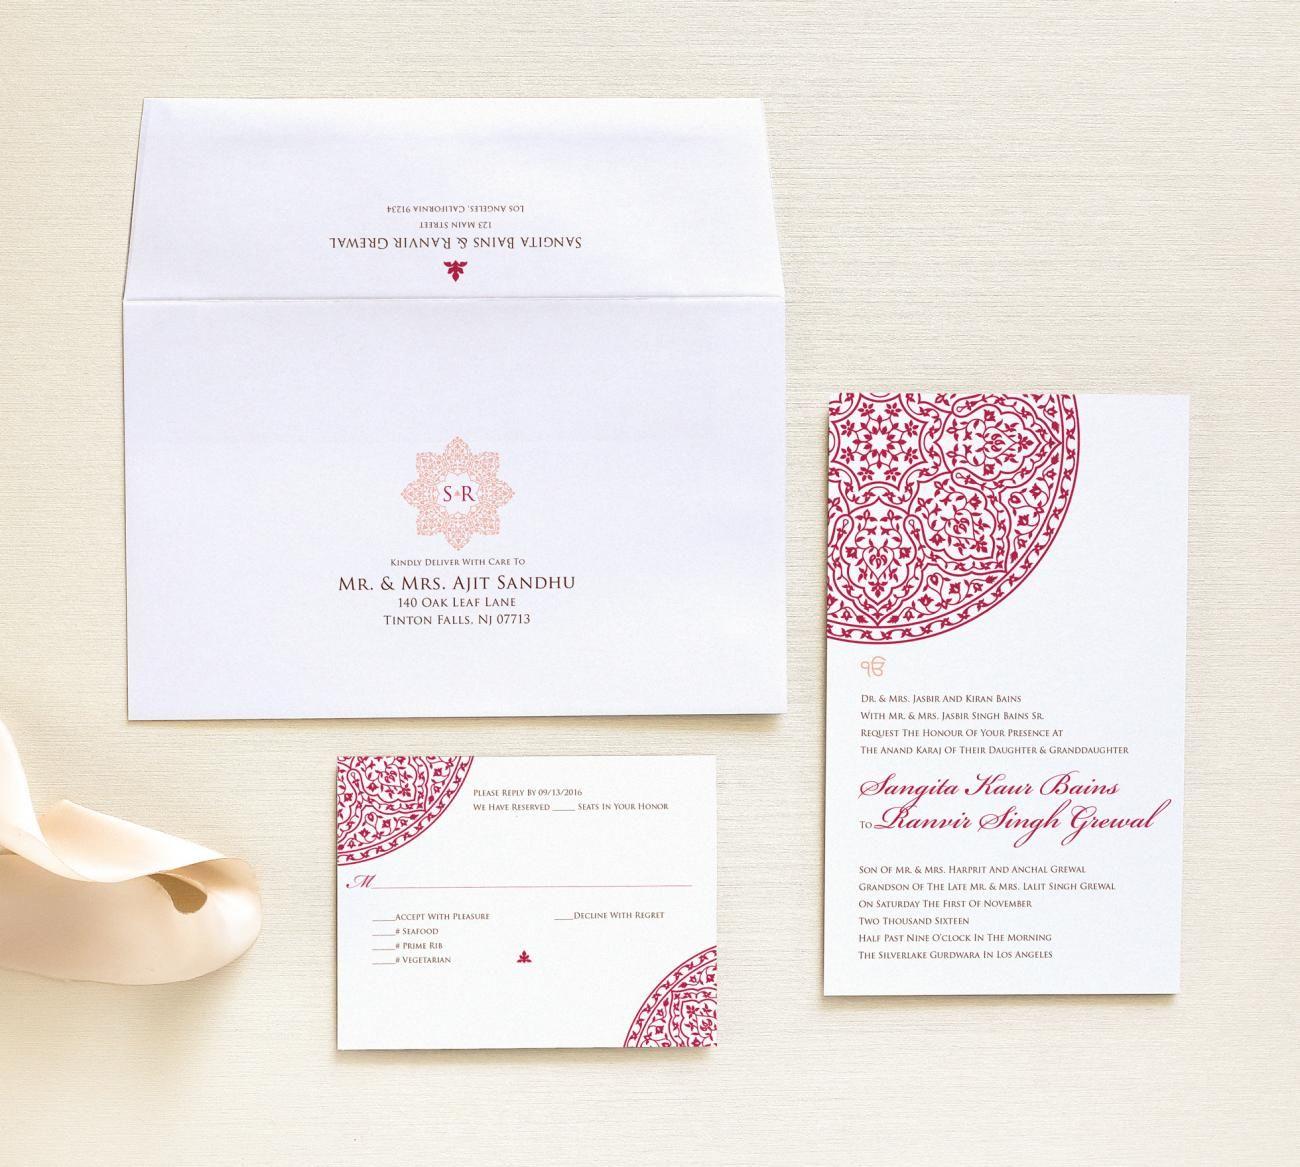 3 Piece Package Cordoba Storybook Invitation envelopes